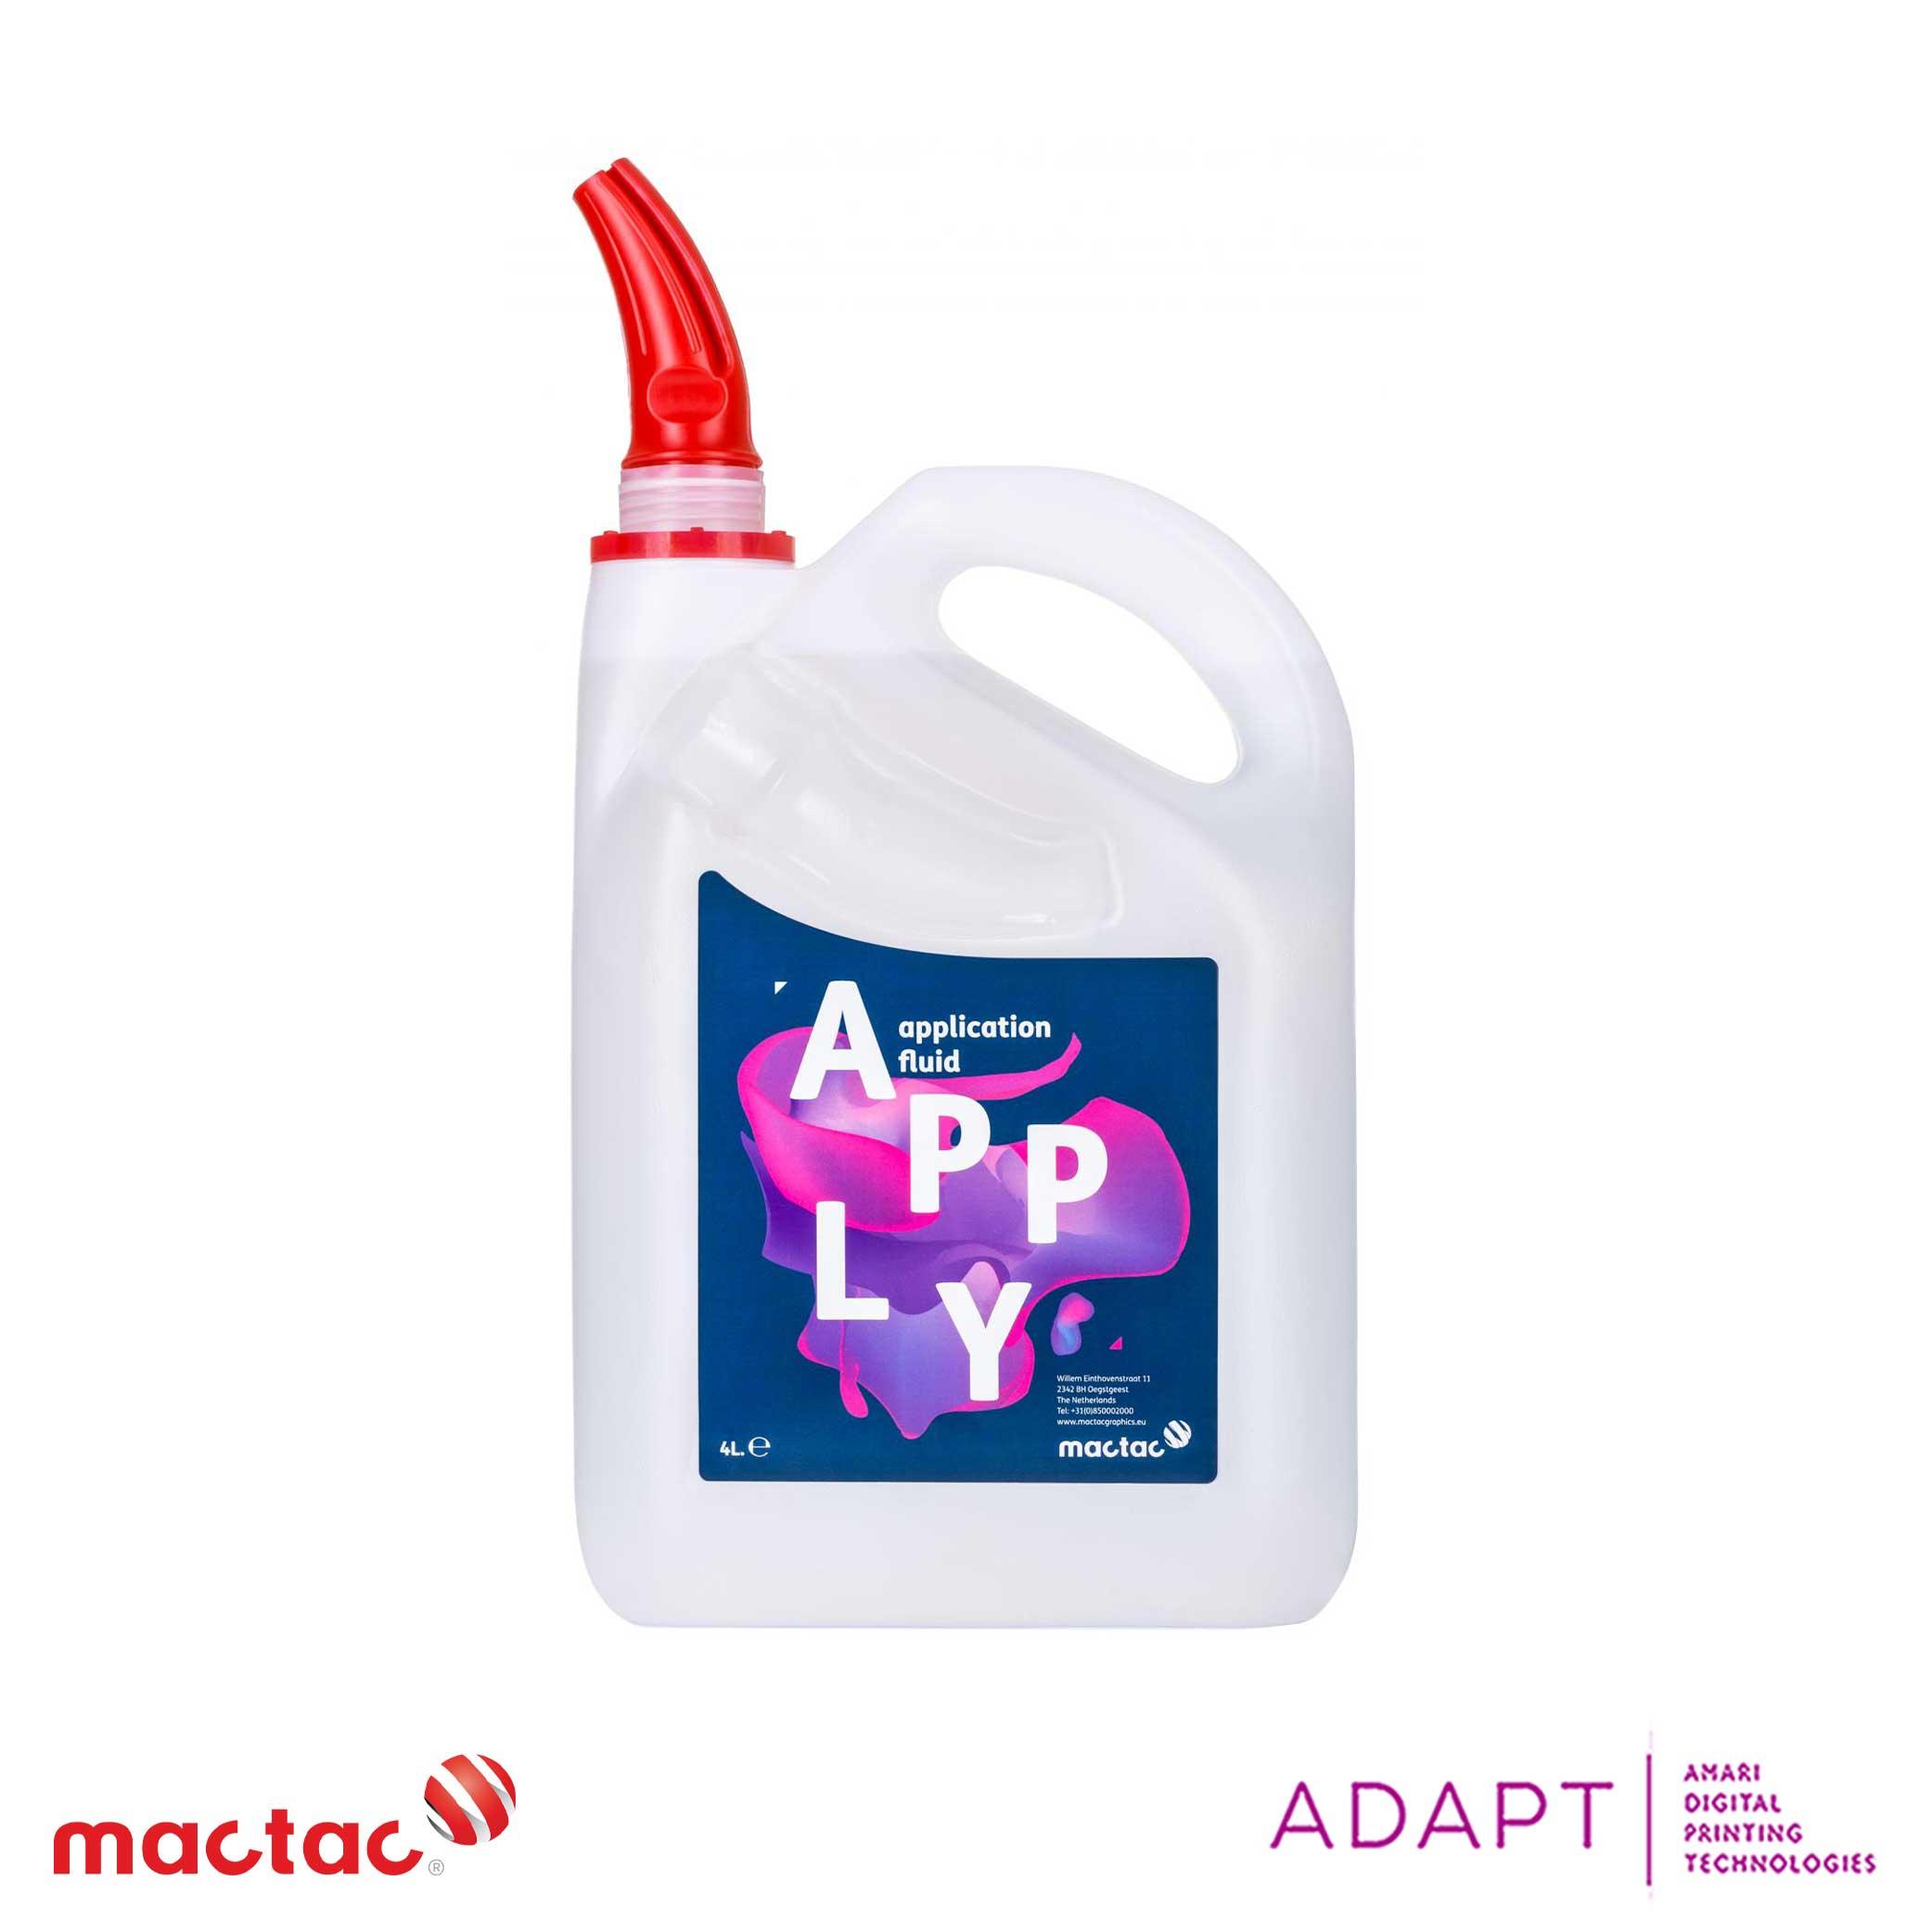 Mactac Cleaners & Application Fluids